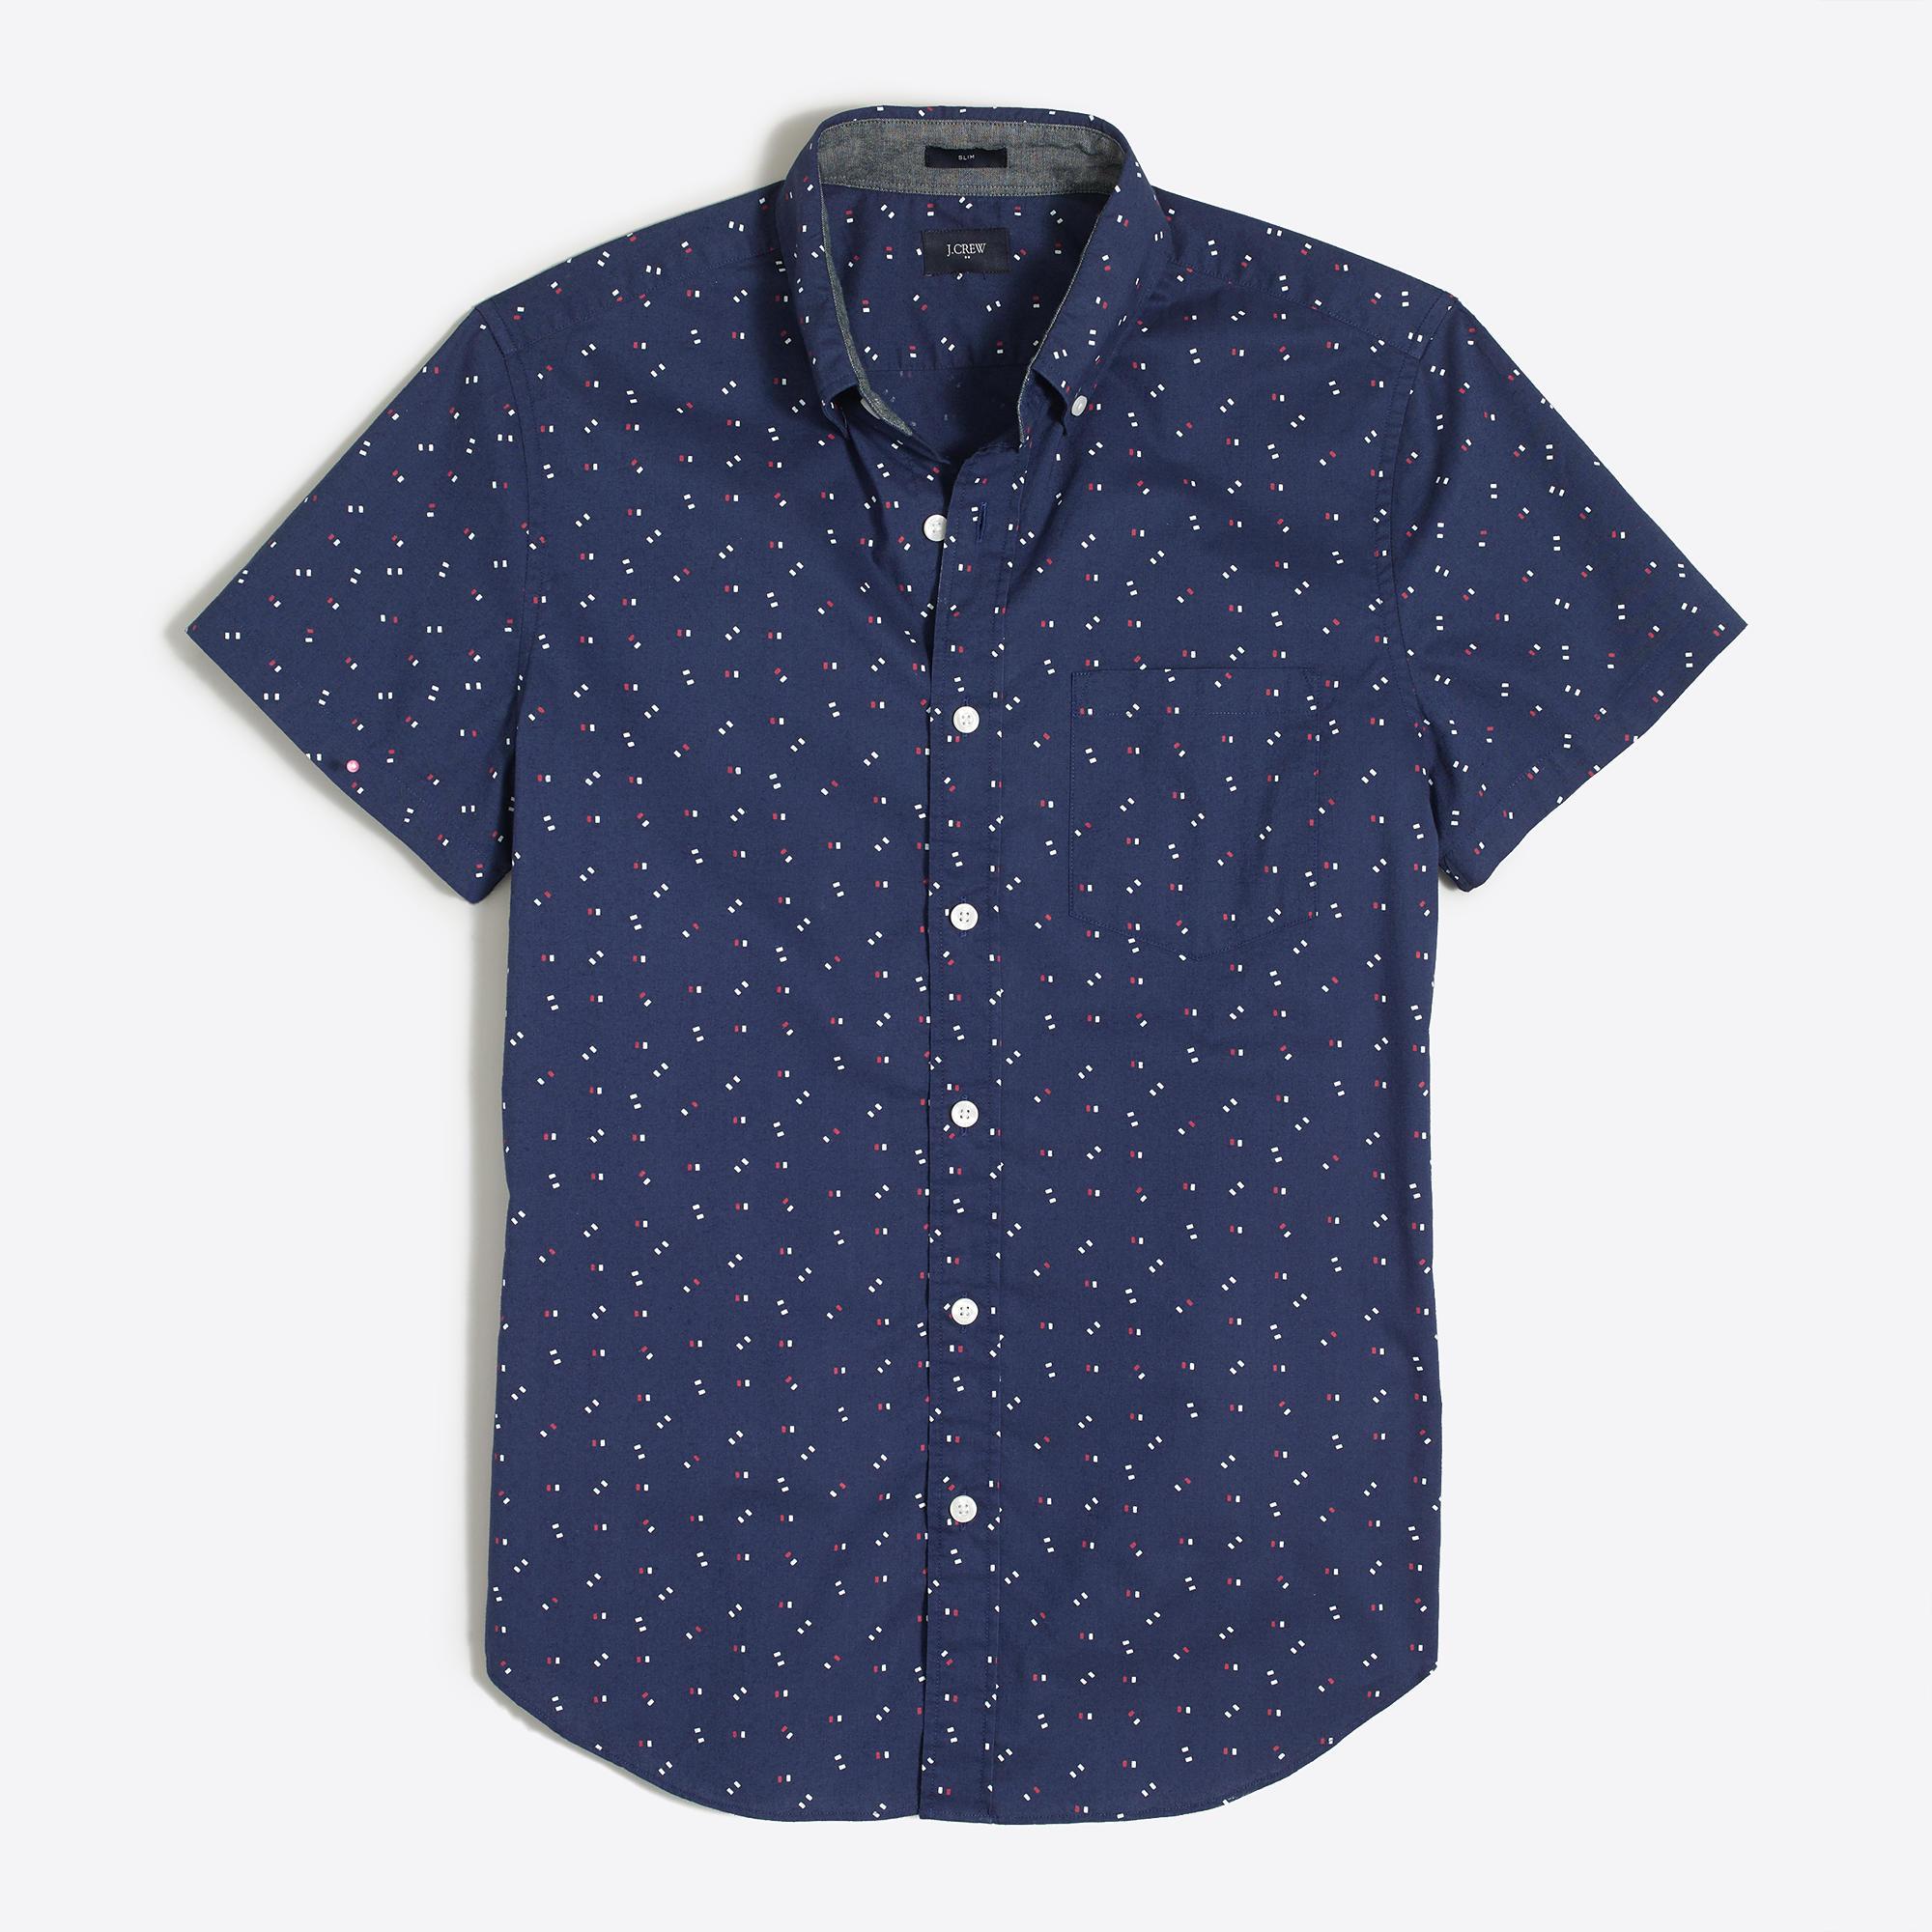 Men's Short-sleeve Shirts | J.Crew Factory - Short Sleeve